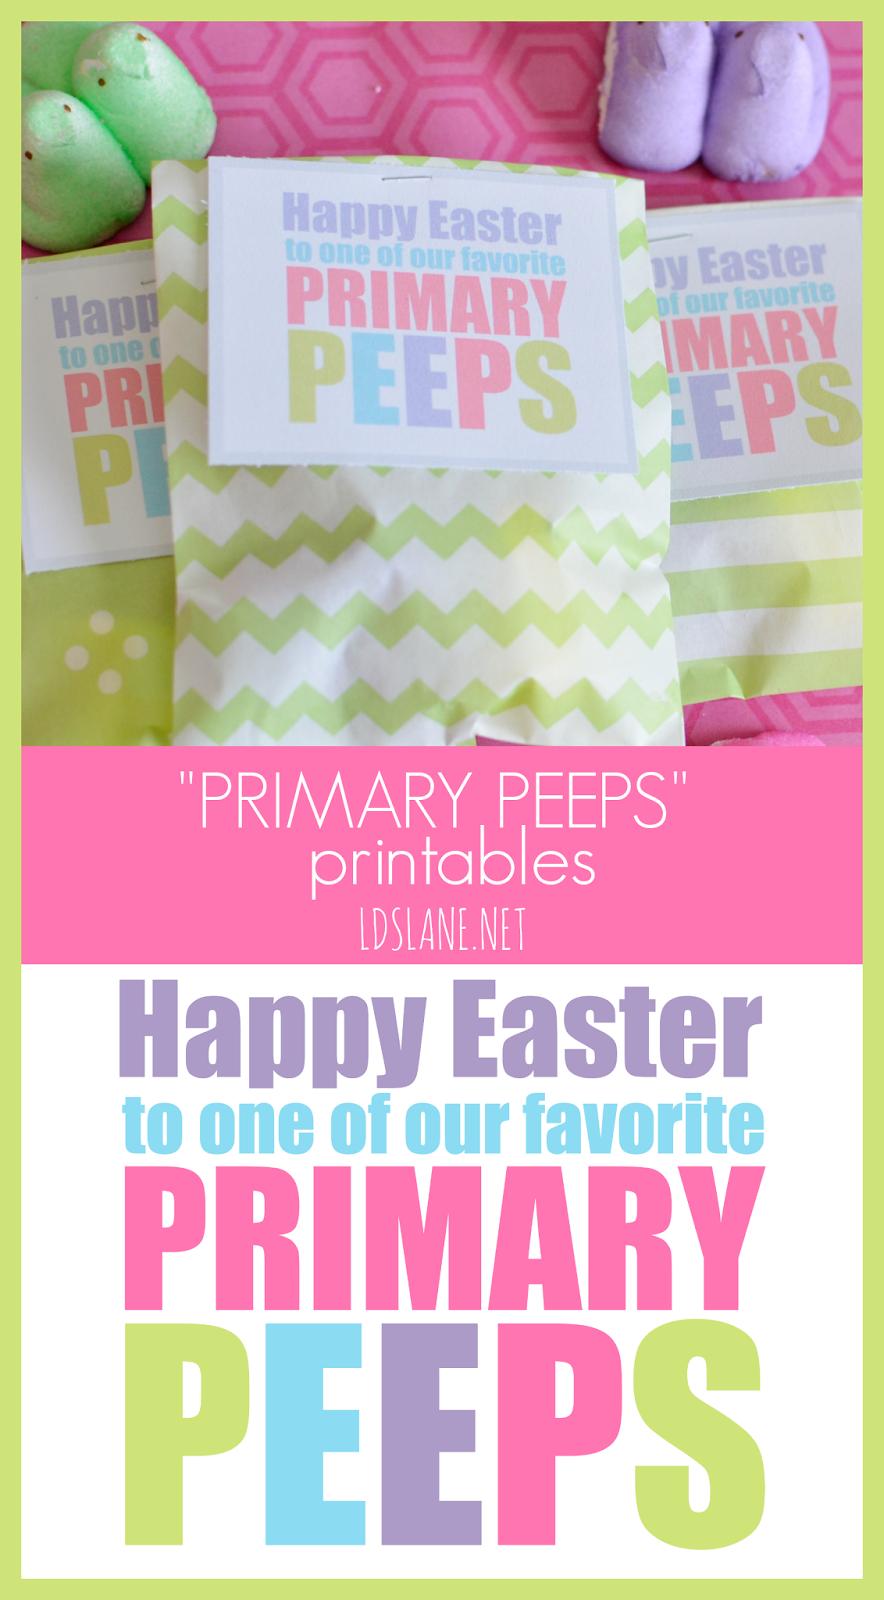 LDS Primary Peeps Printables by LDSLane.net | Primary | Pinterest ...